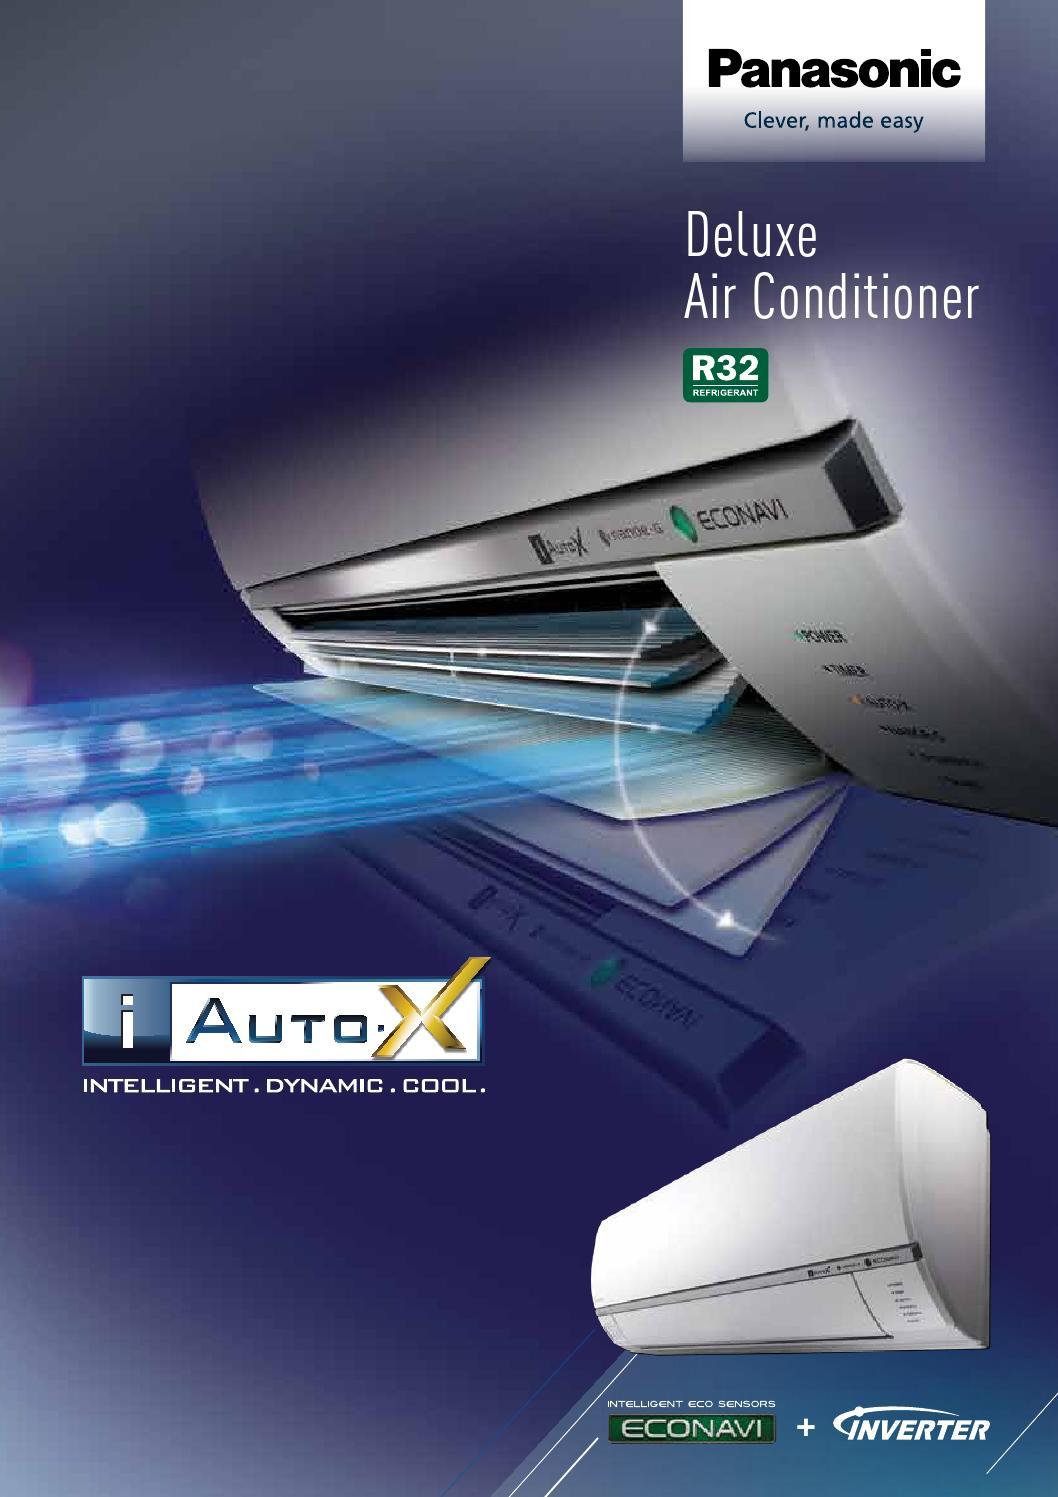 J0004749 Deluxe Ac Brochure Update V4 By Panasonic Nz Issuu